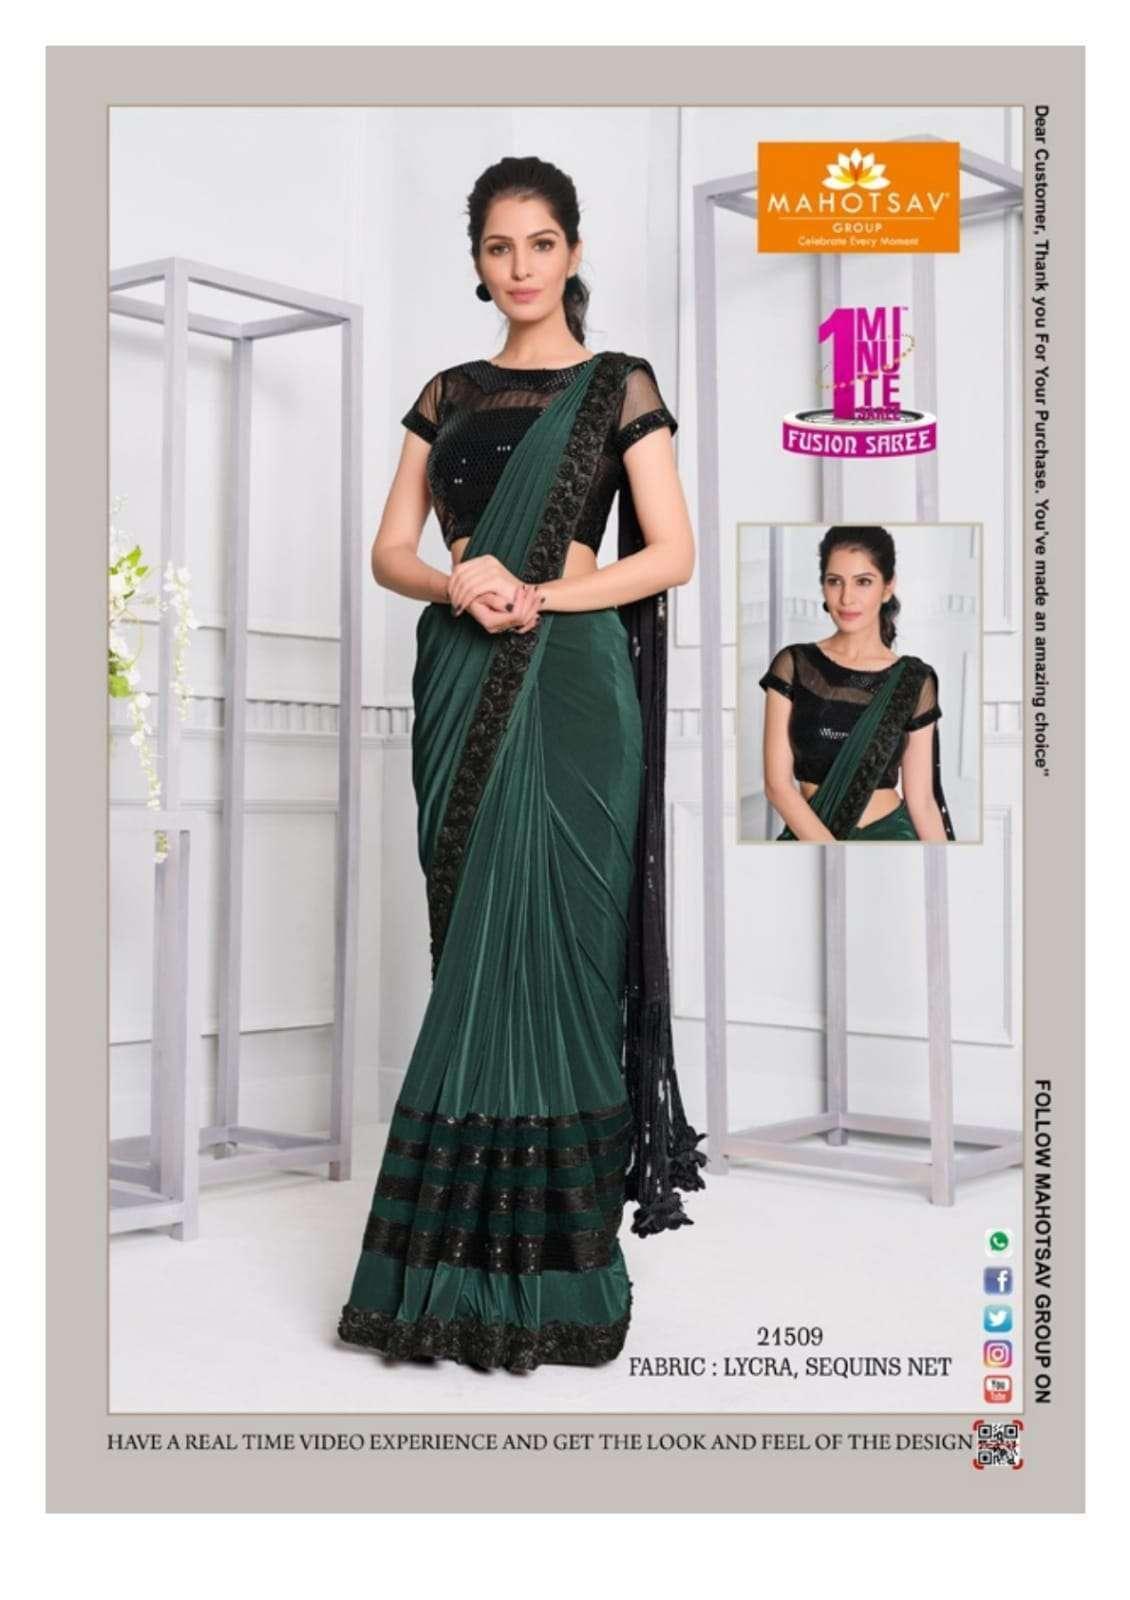 Mahotsav Moh Manthan Izzara 21501 To 215018 Series Fancy Designer Sarees Collection 21509